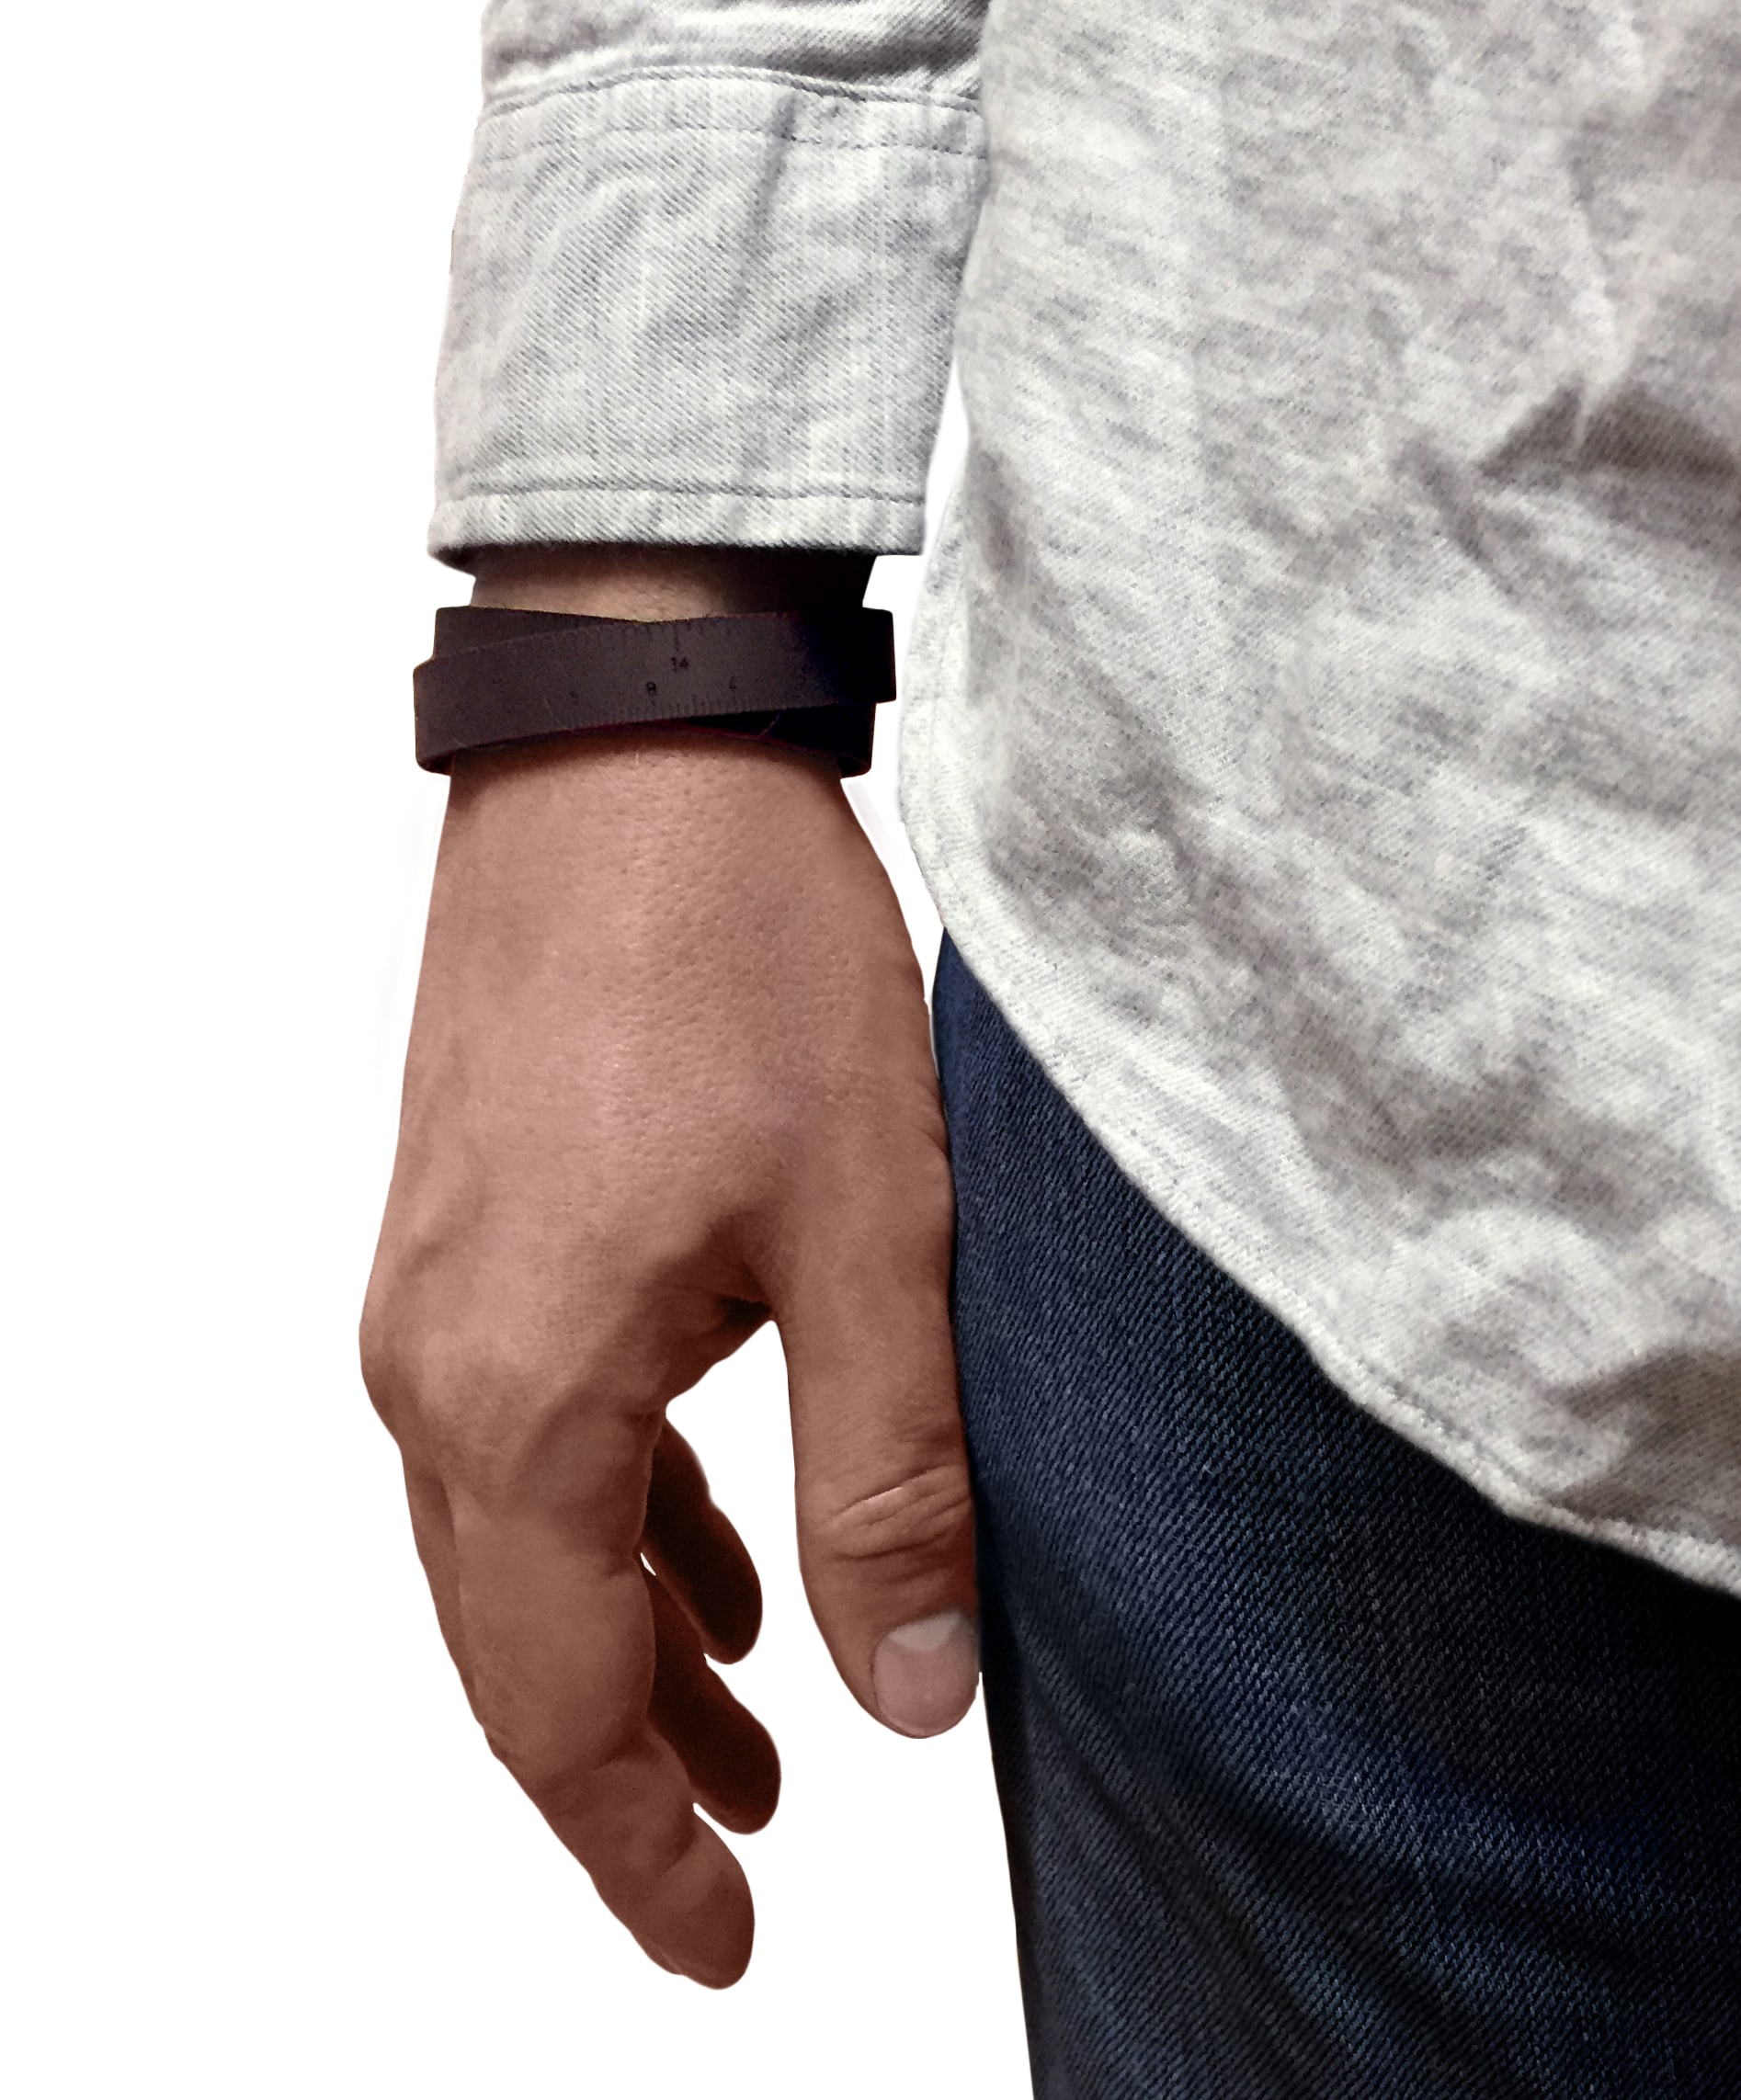 Wrist ruler | ultimate gift guide for crocheters